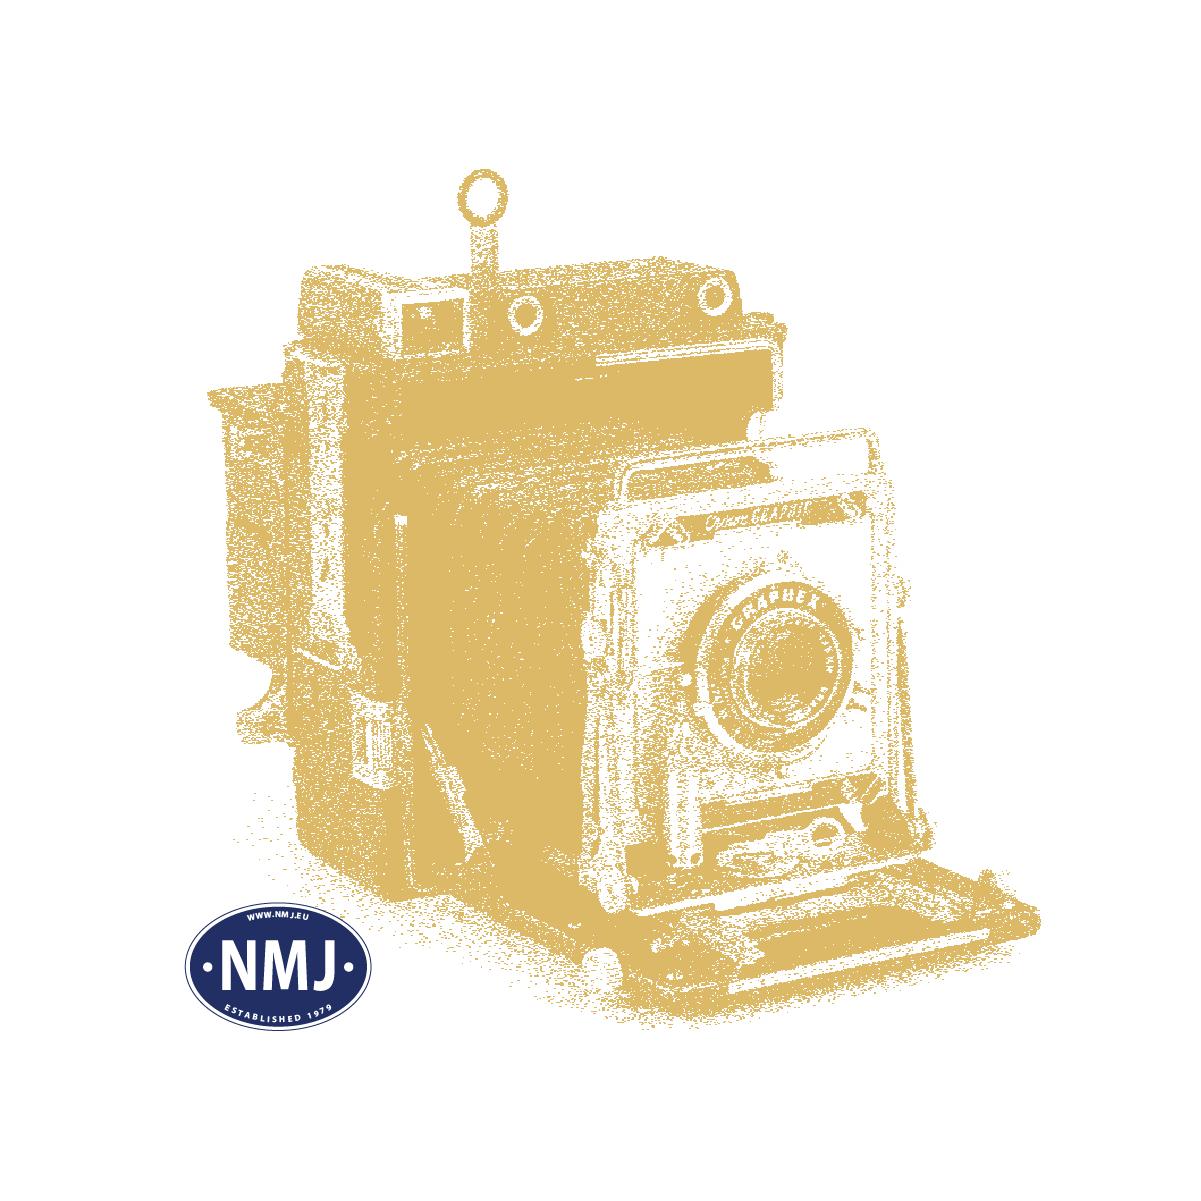 ZIMMX630F - MX630F HO Dekoder m/ NEM651 Plugg (6 pins), Multiprotokoll